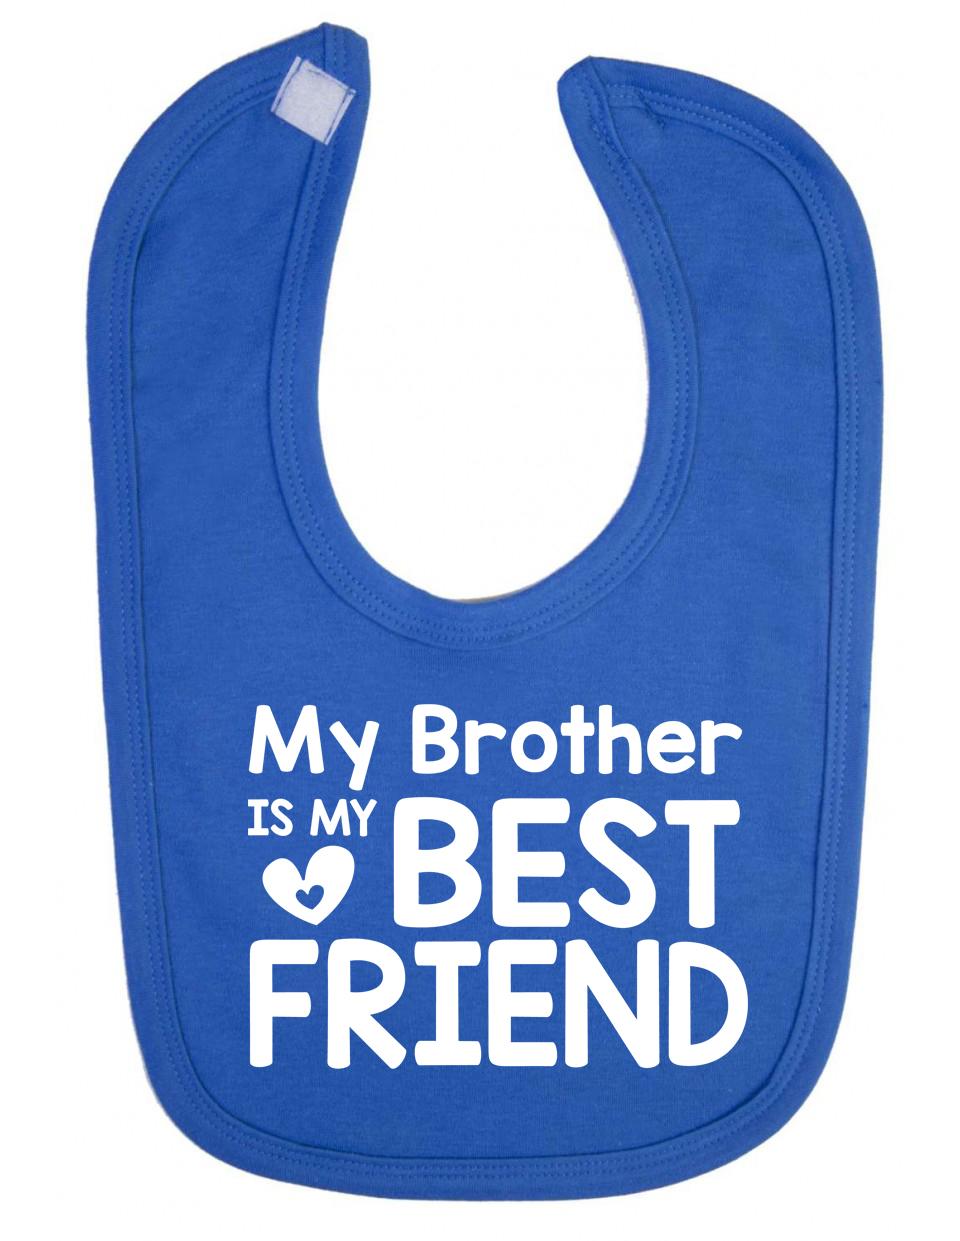 My Brother is my Best Friend Cute Newborn Toddler Baby Bib